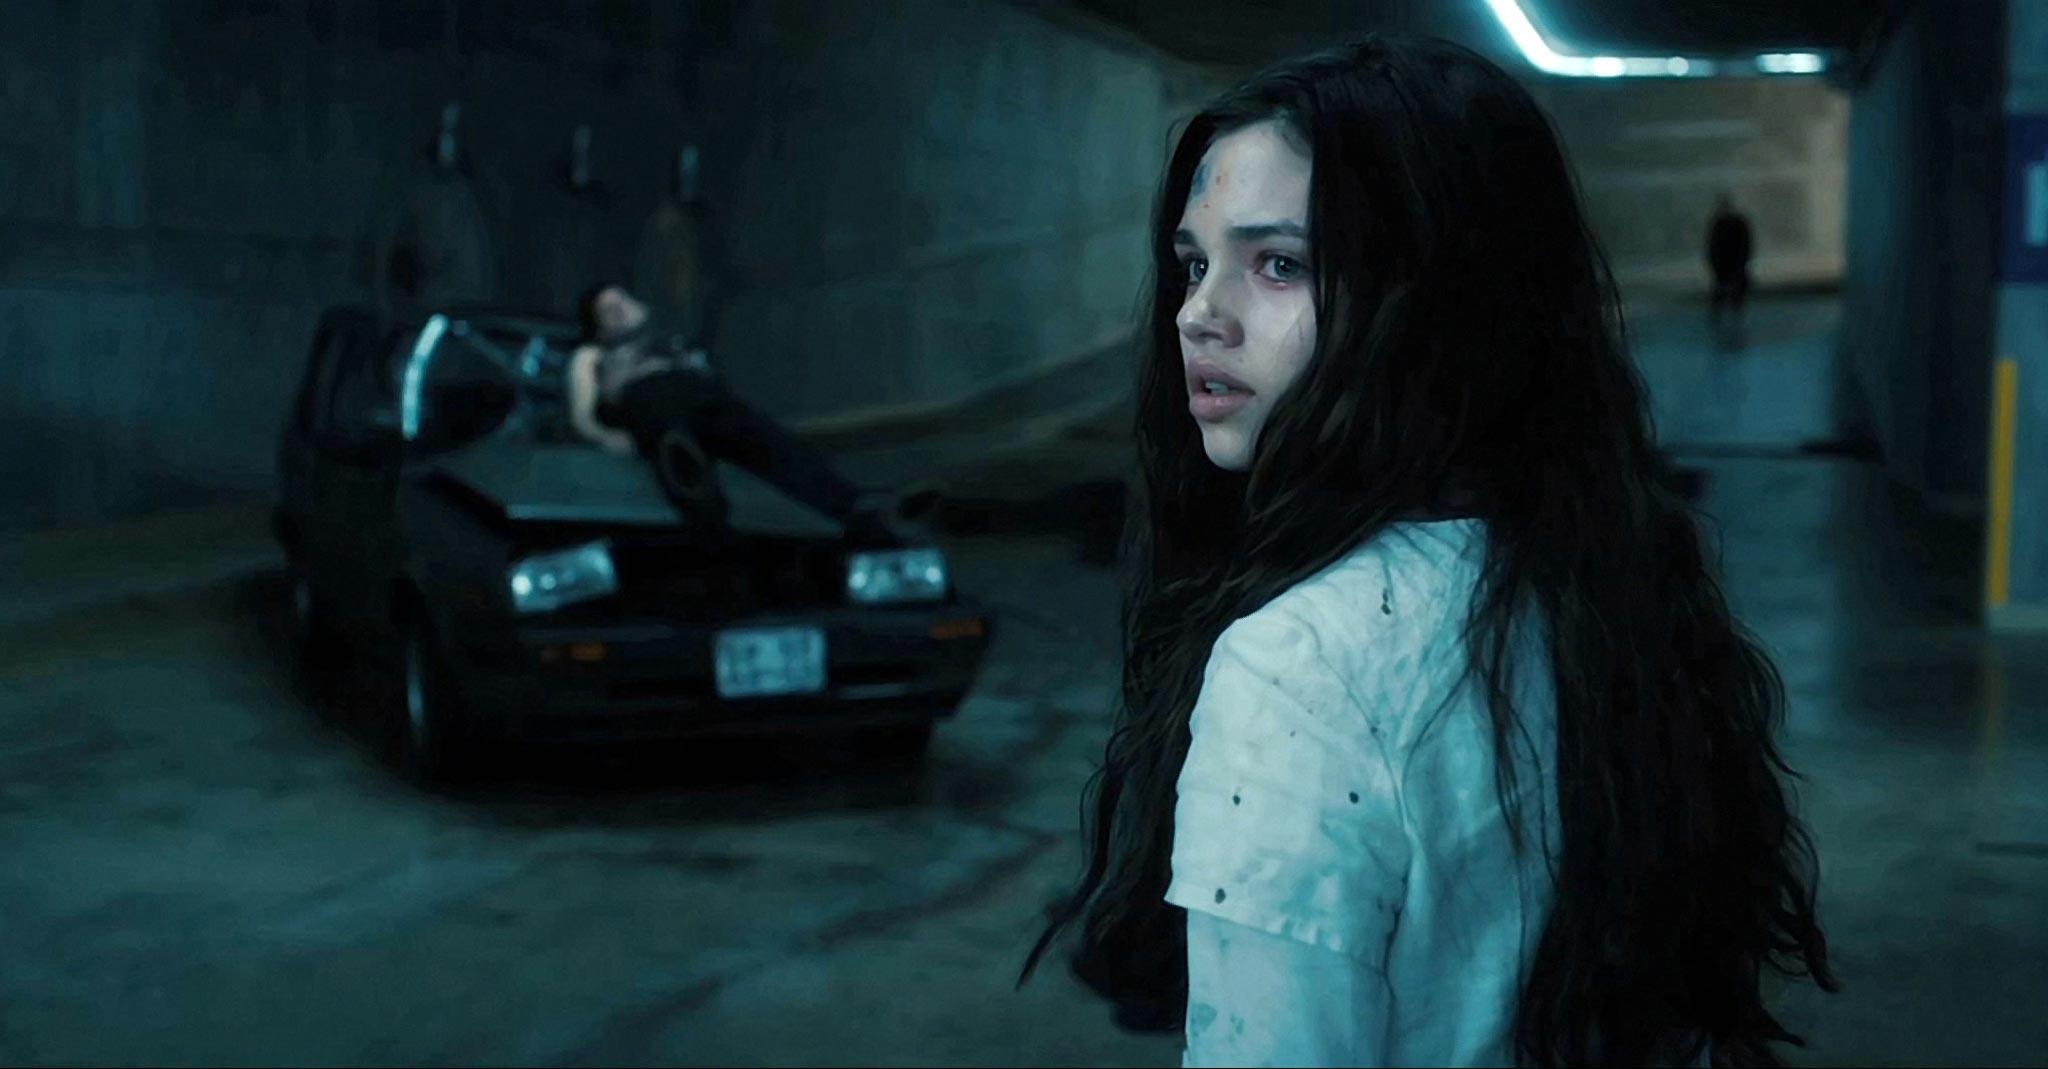 India Eisley as Selene's daughter Eve in Underworld Awakening (2012)